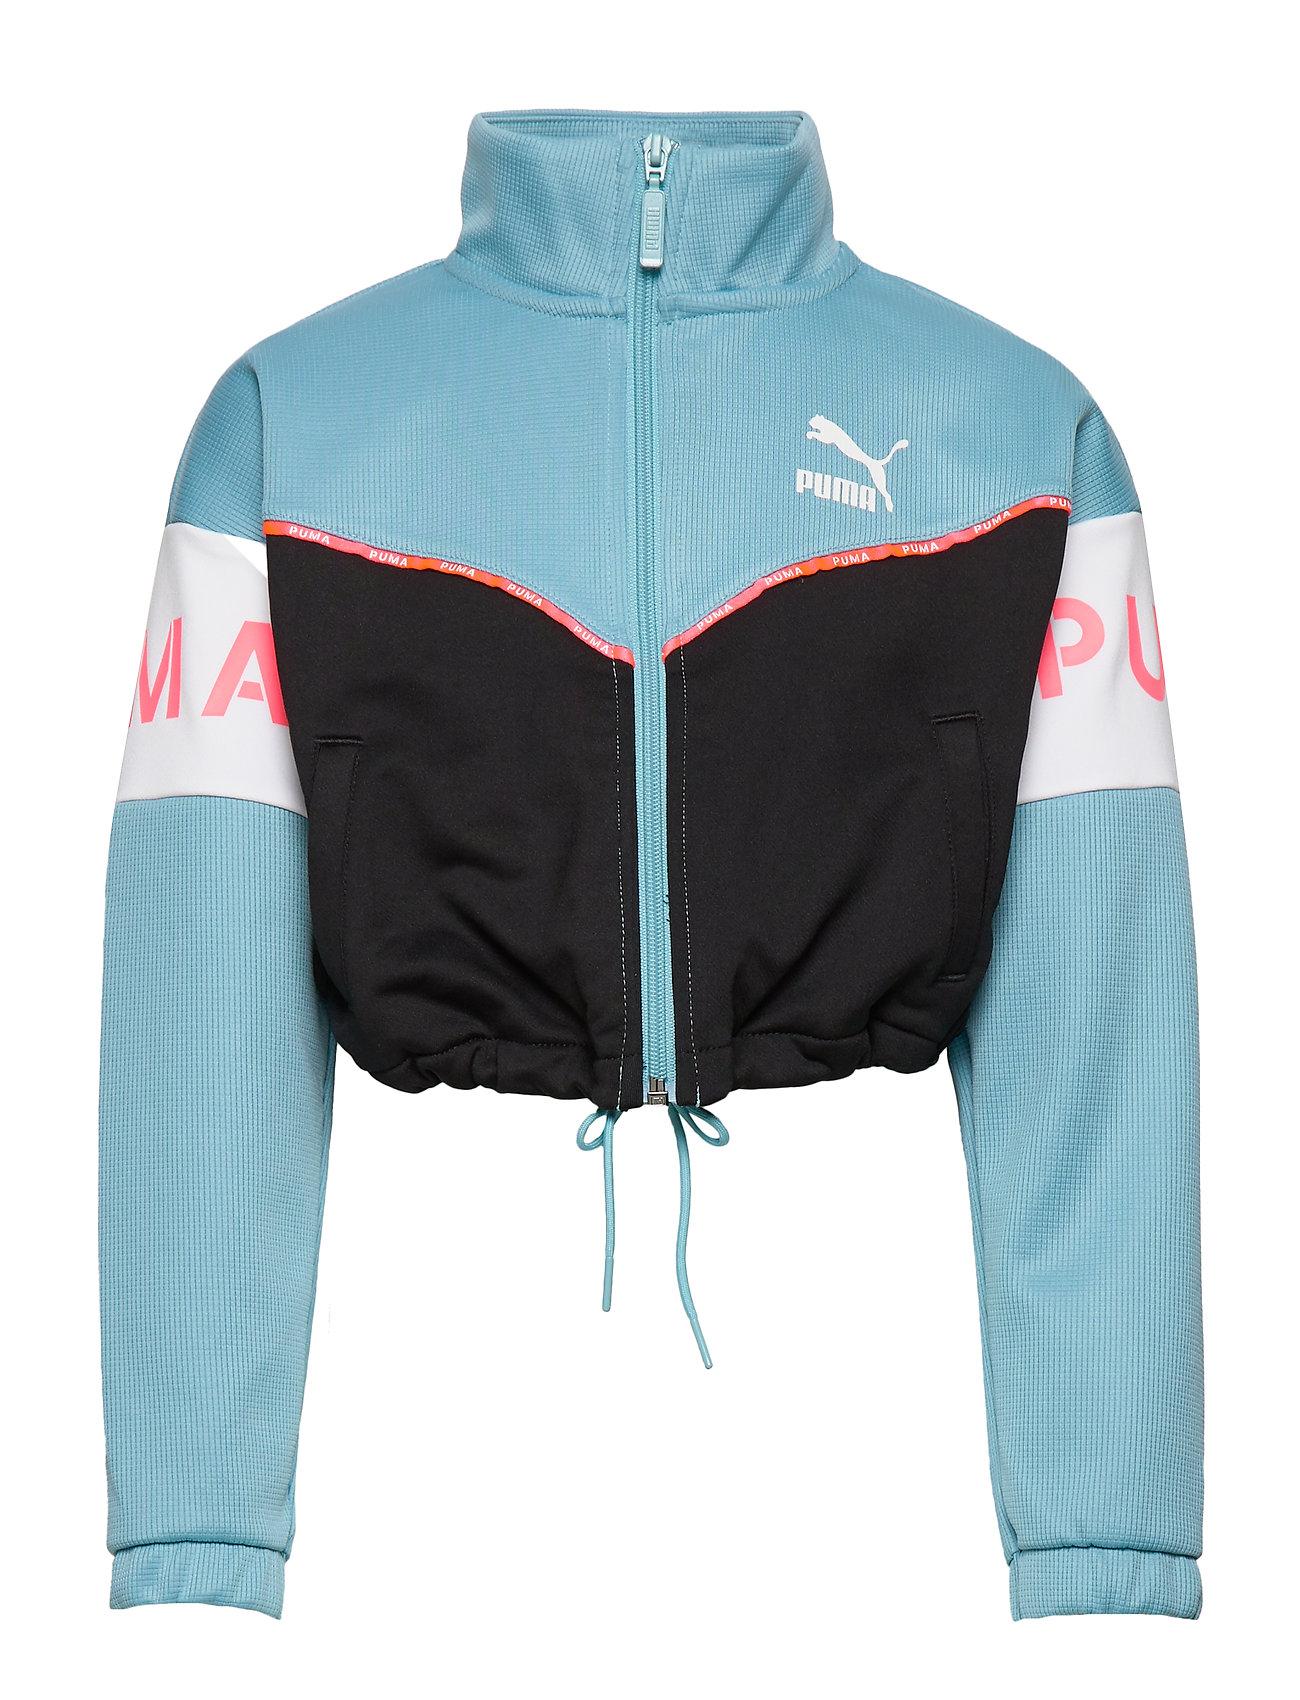 PUMA XTG Track Jacket G - MILKY BLUE